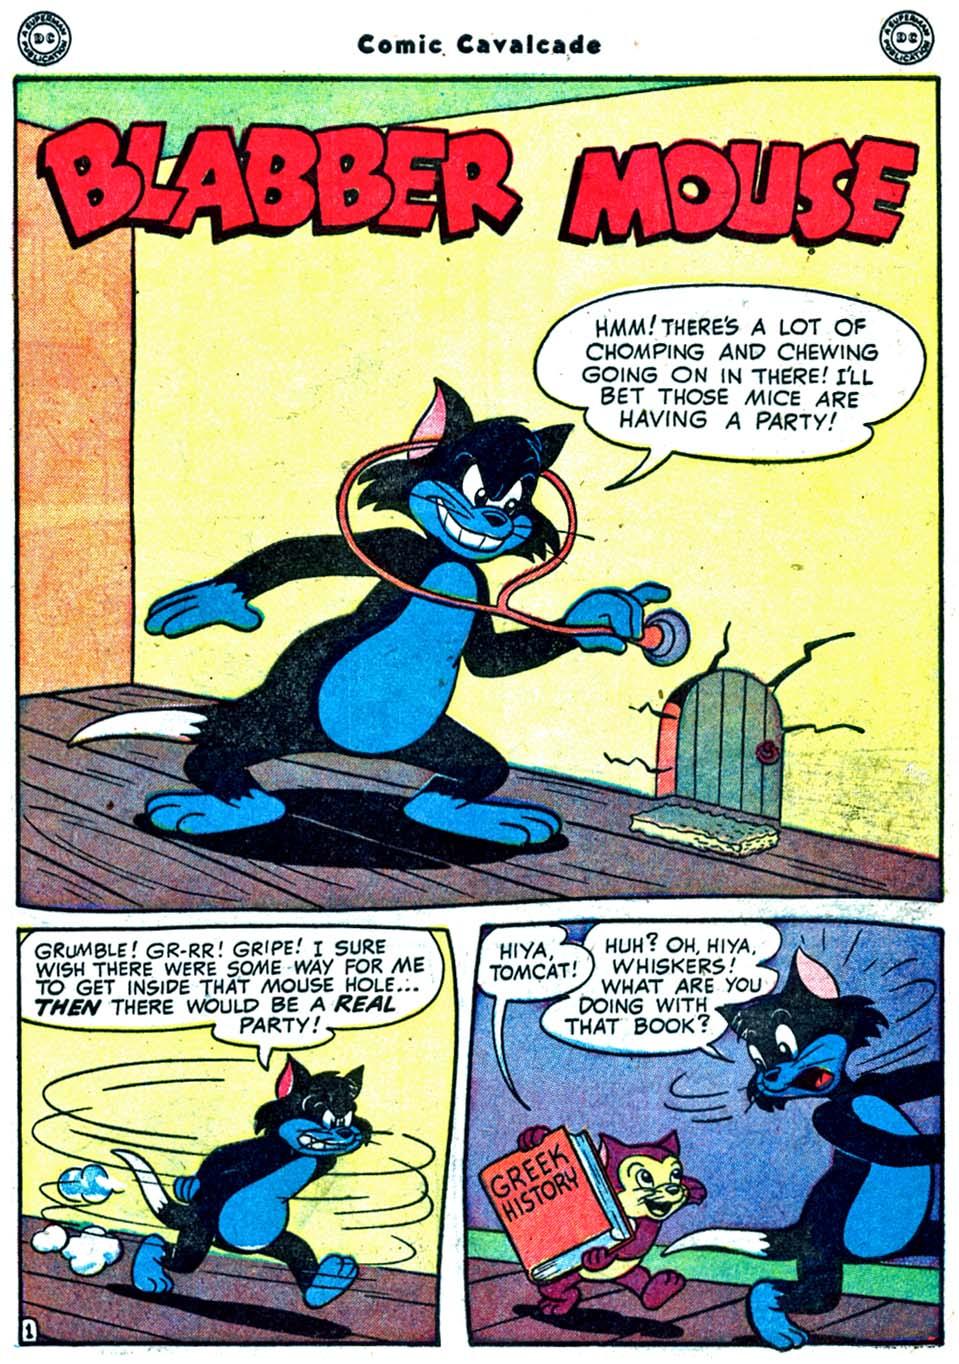 Comic Cavalcade issue 32 - Page 13